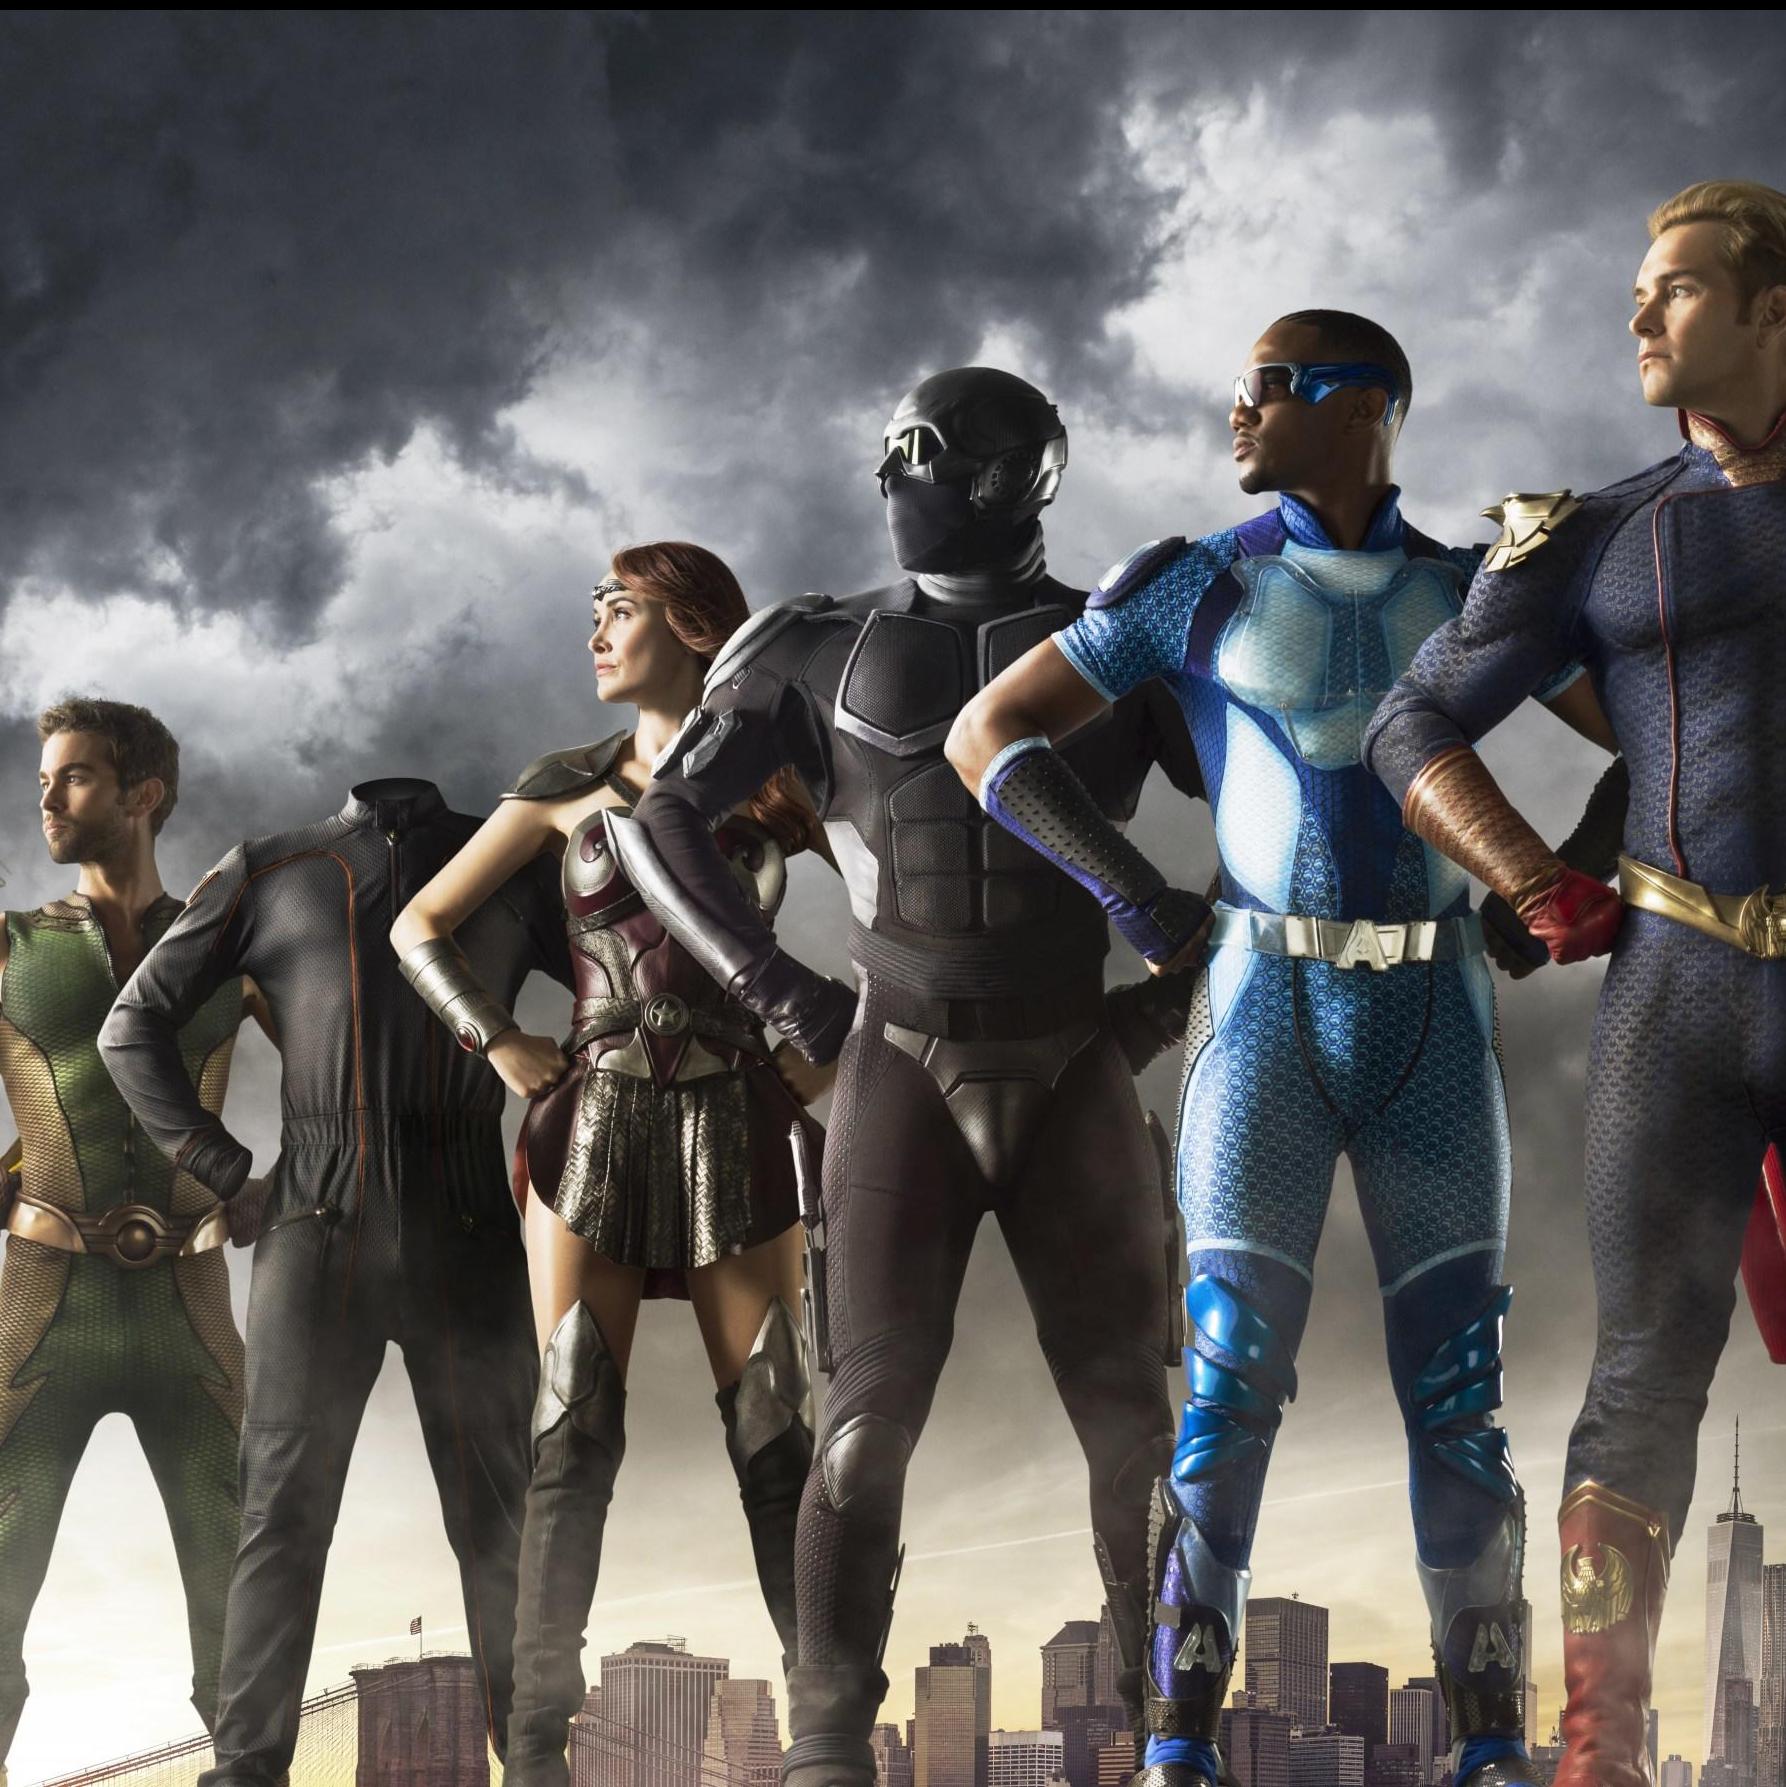 <p>如果英雄的人格並非完美?《黑袍糾察隊》寫實刻劃如果超級英雄真實存在的世界</p>